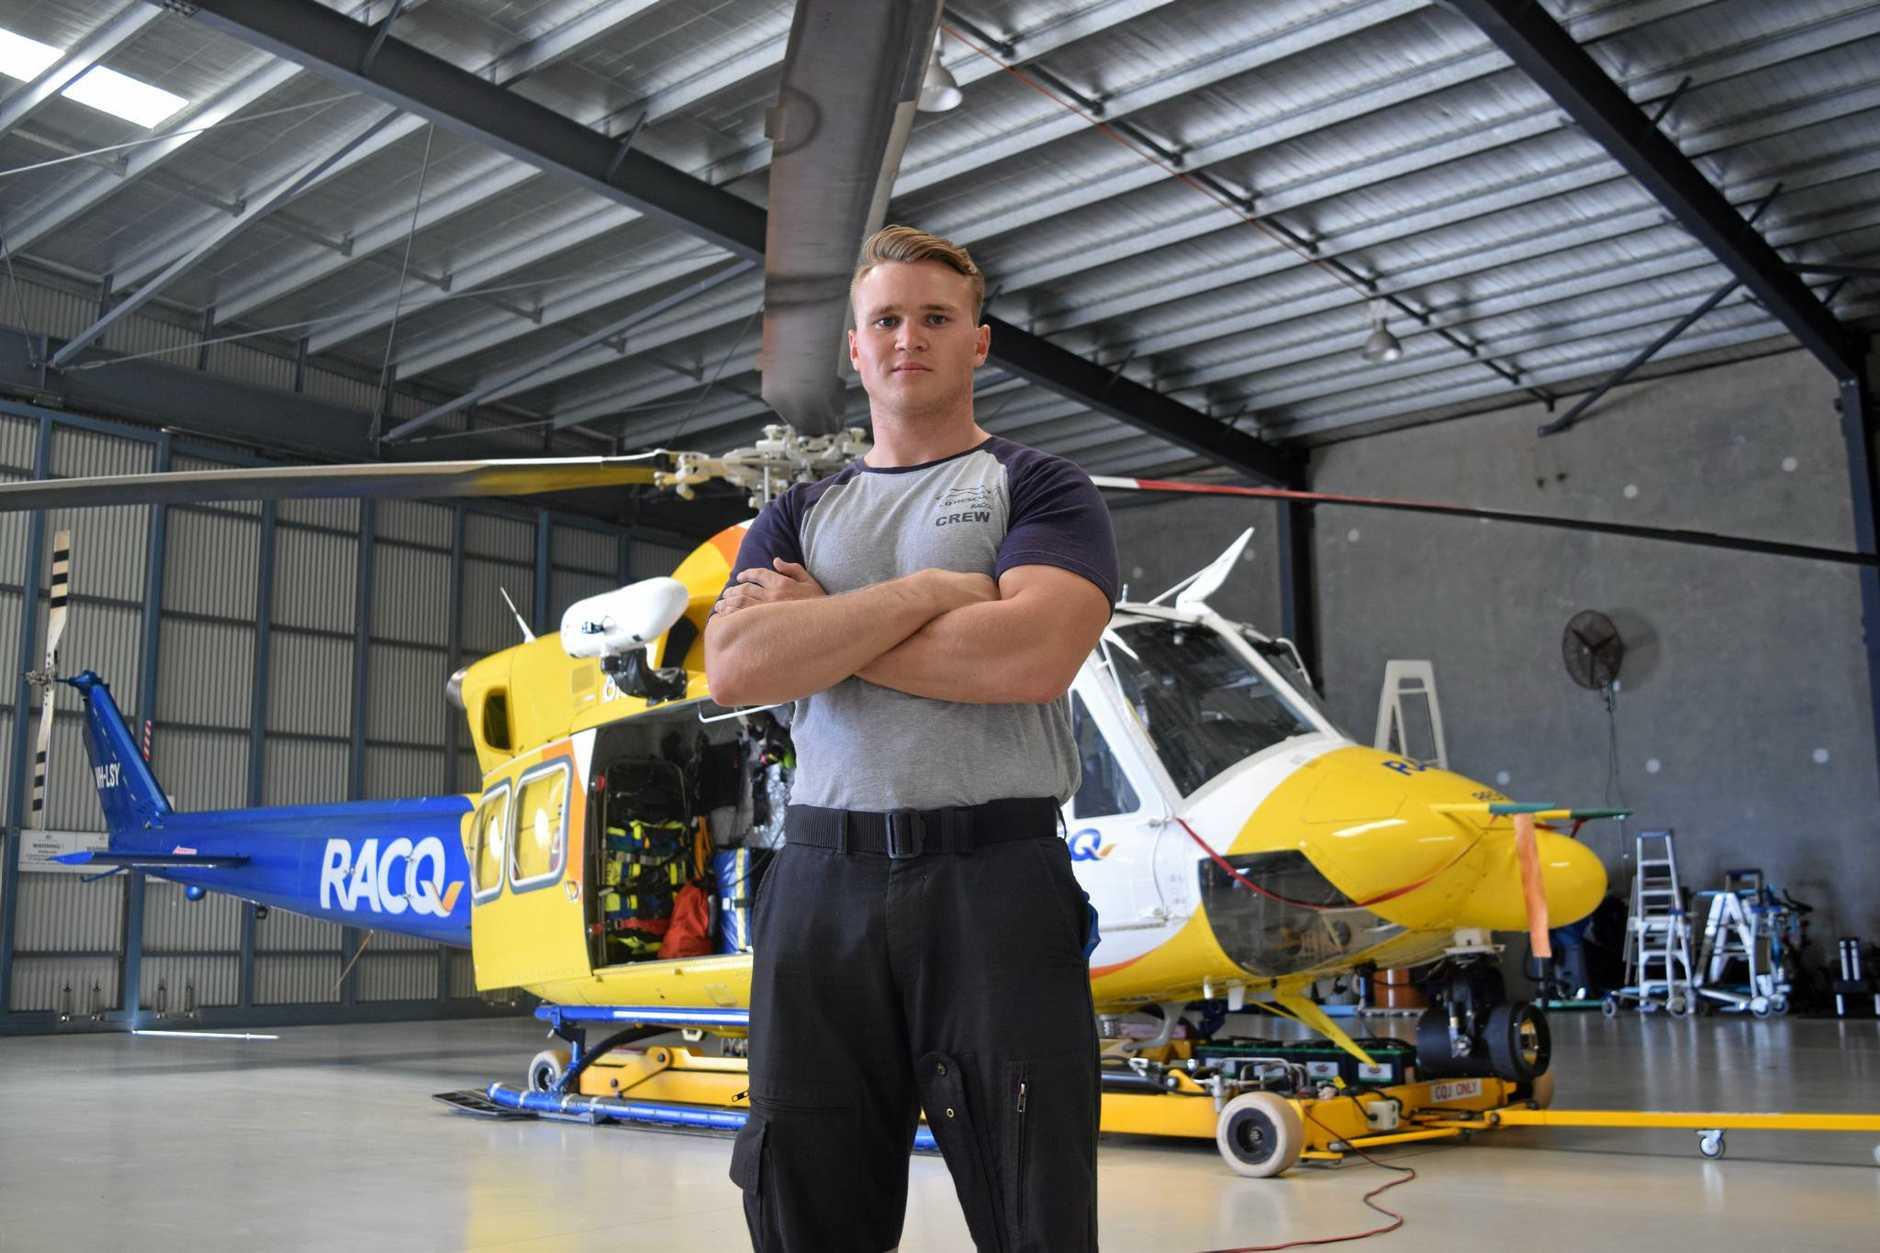 DREAM JOB: Callum Good, 21, always wanted to be a CQ Rescue crewman.